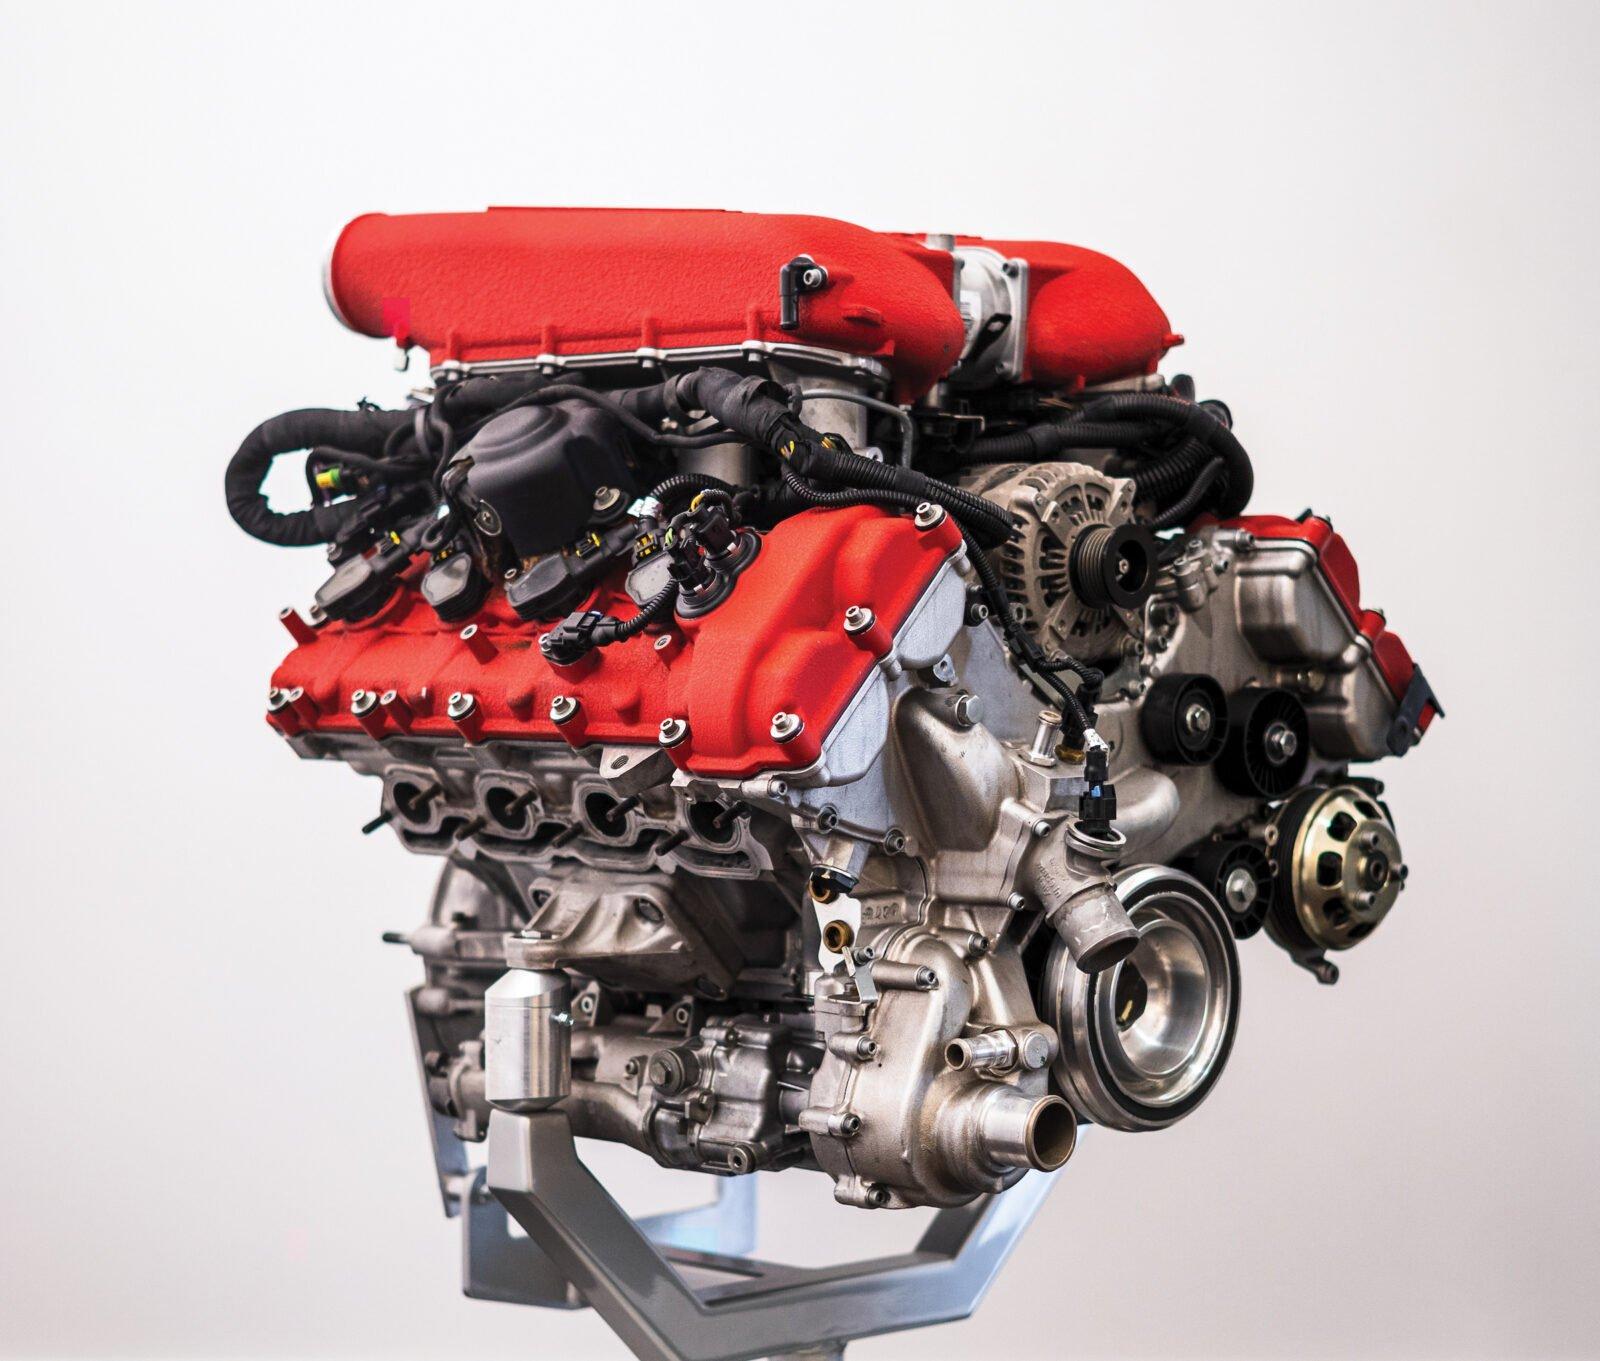 Crate Engine Heaven: A Ferrari 458 V8 With 562 BHP